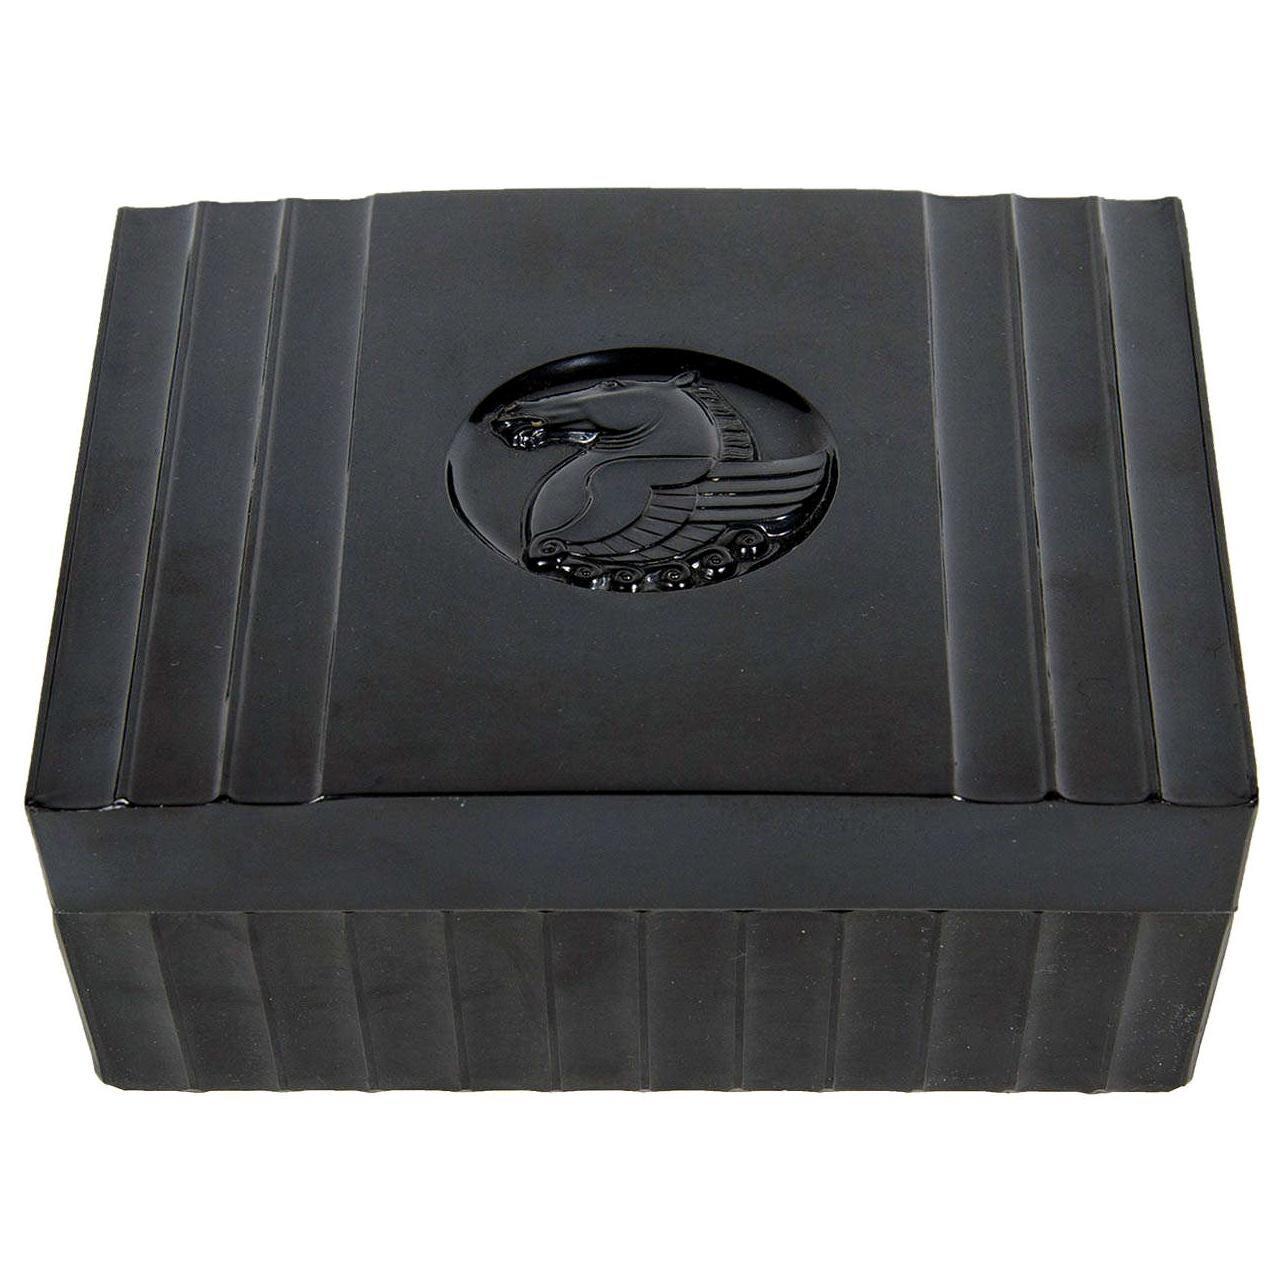 Art Deco Machine Age Black Bakelite Box with a Bas Relief Pegasus Center